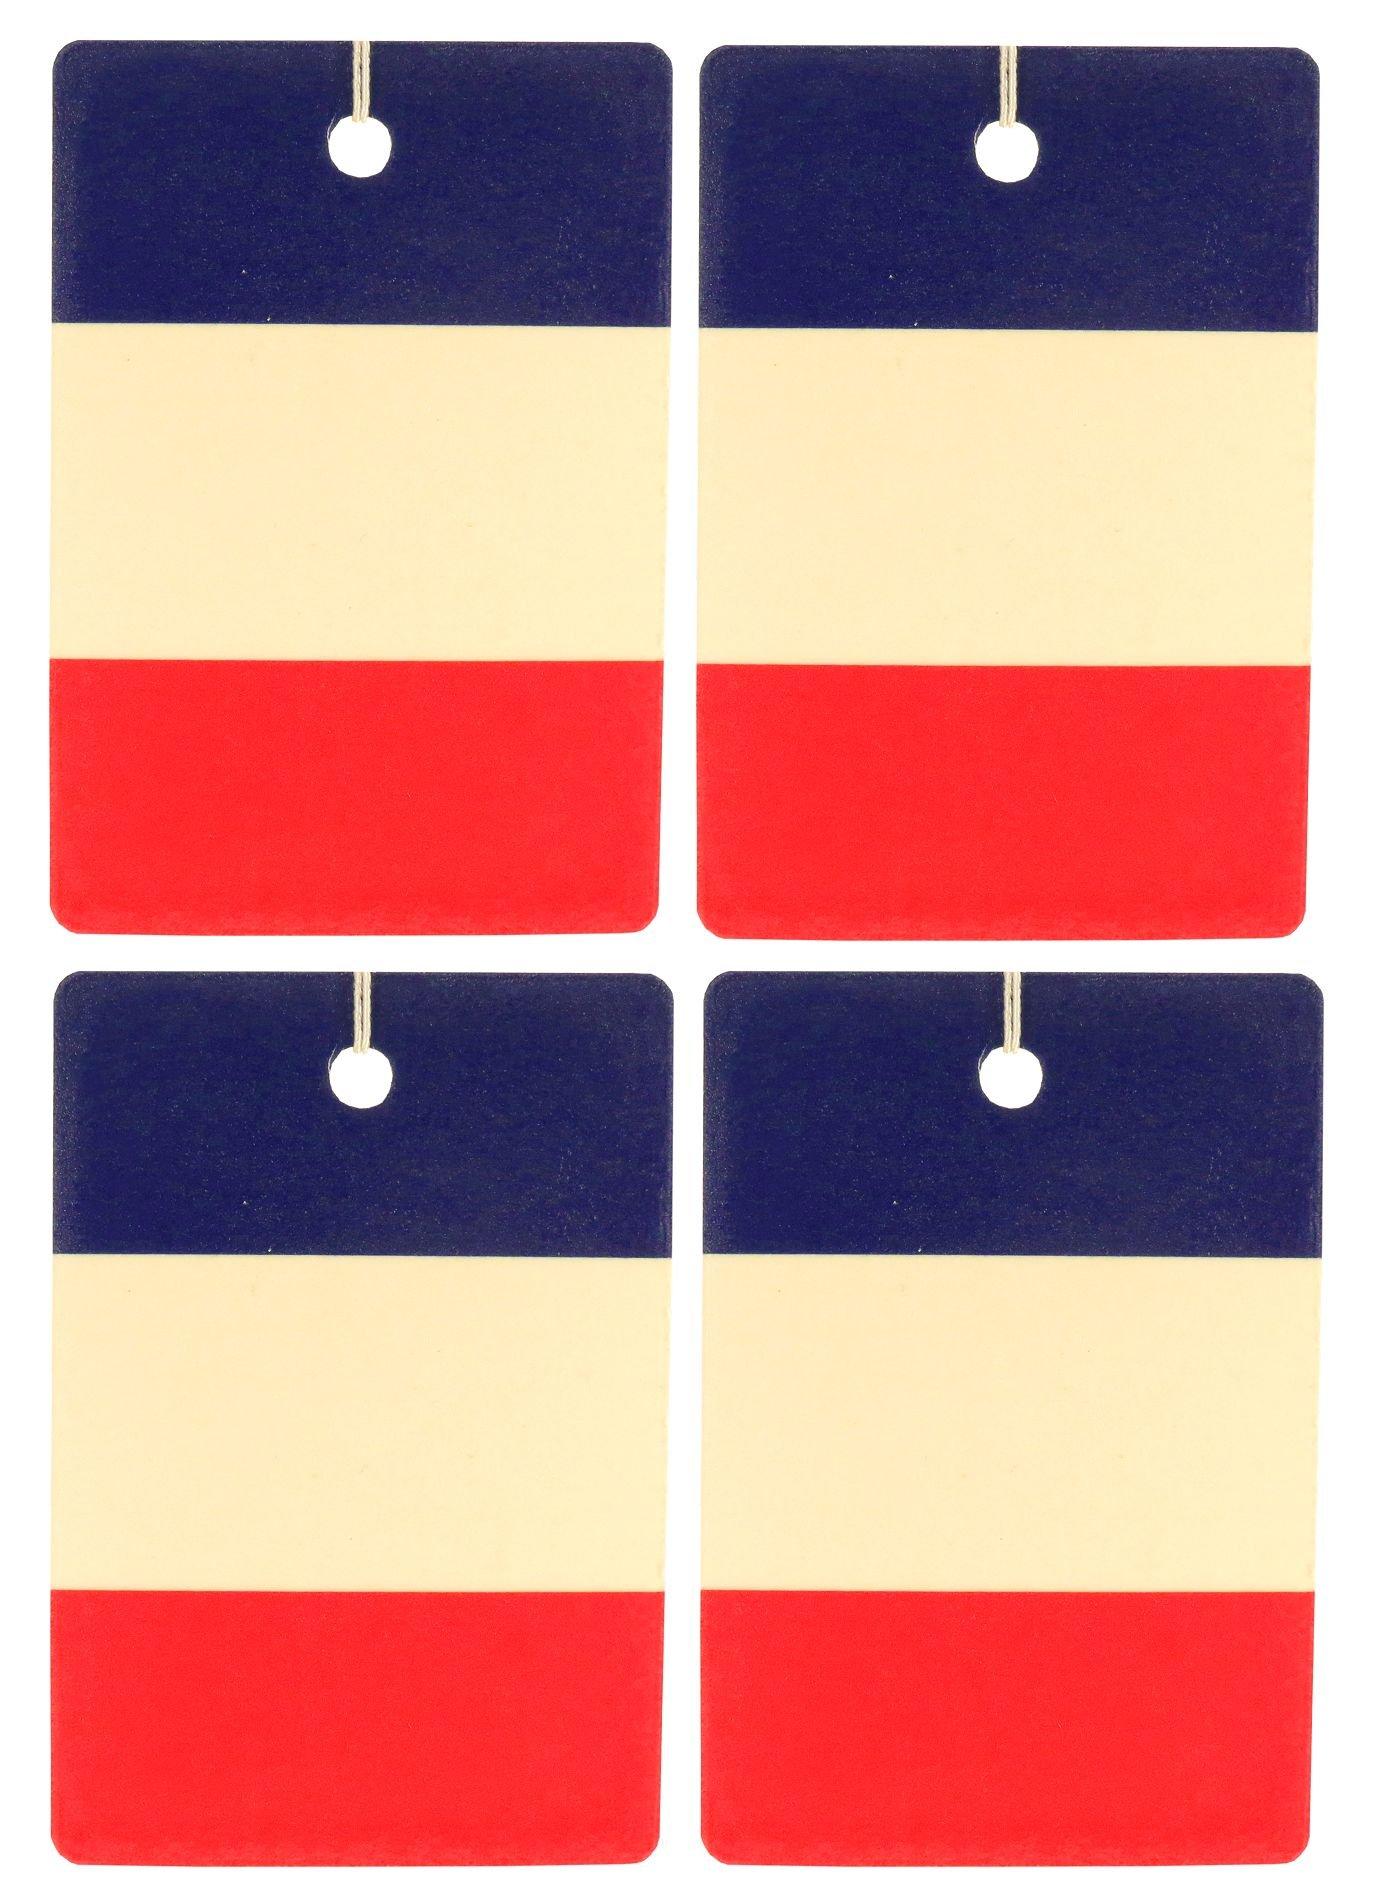 Set of Four French Flag Air Fresheners, Vertical, Cedarwood Essential Oil